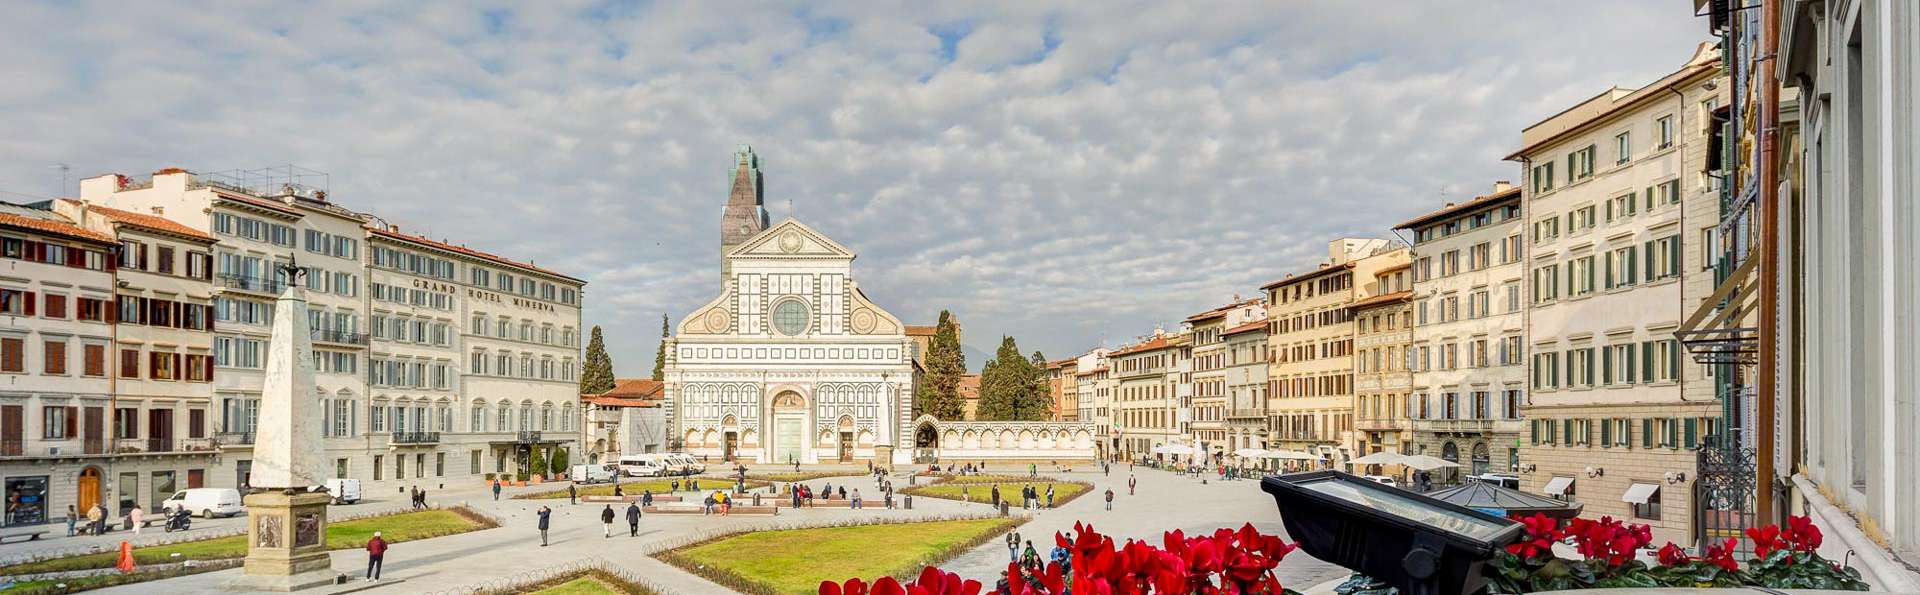 Weekend Città d\'arte e capitali Firenze con Cena tipica ...